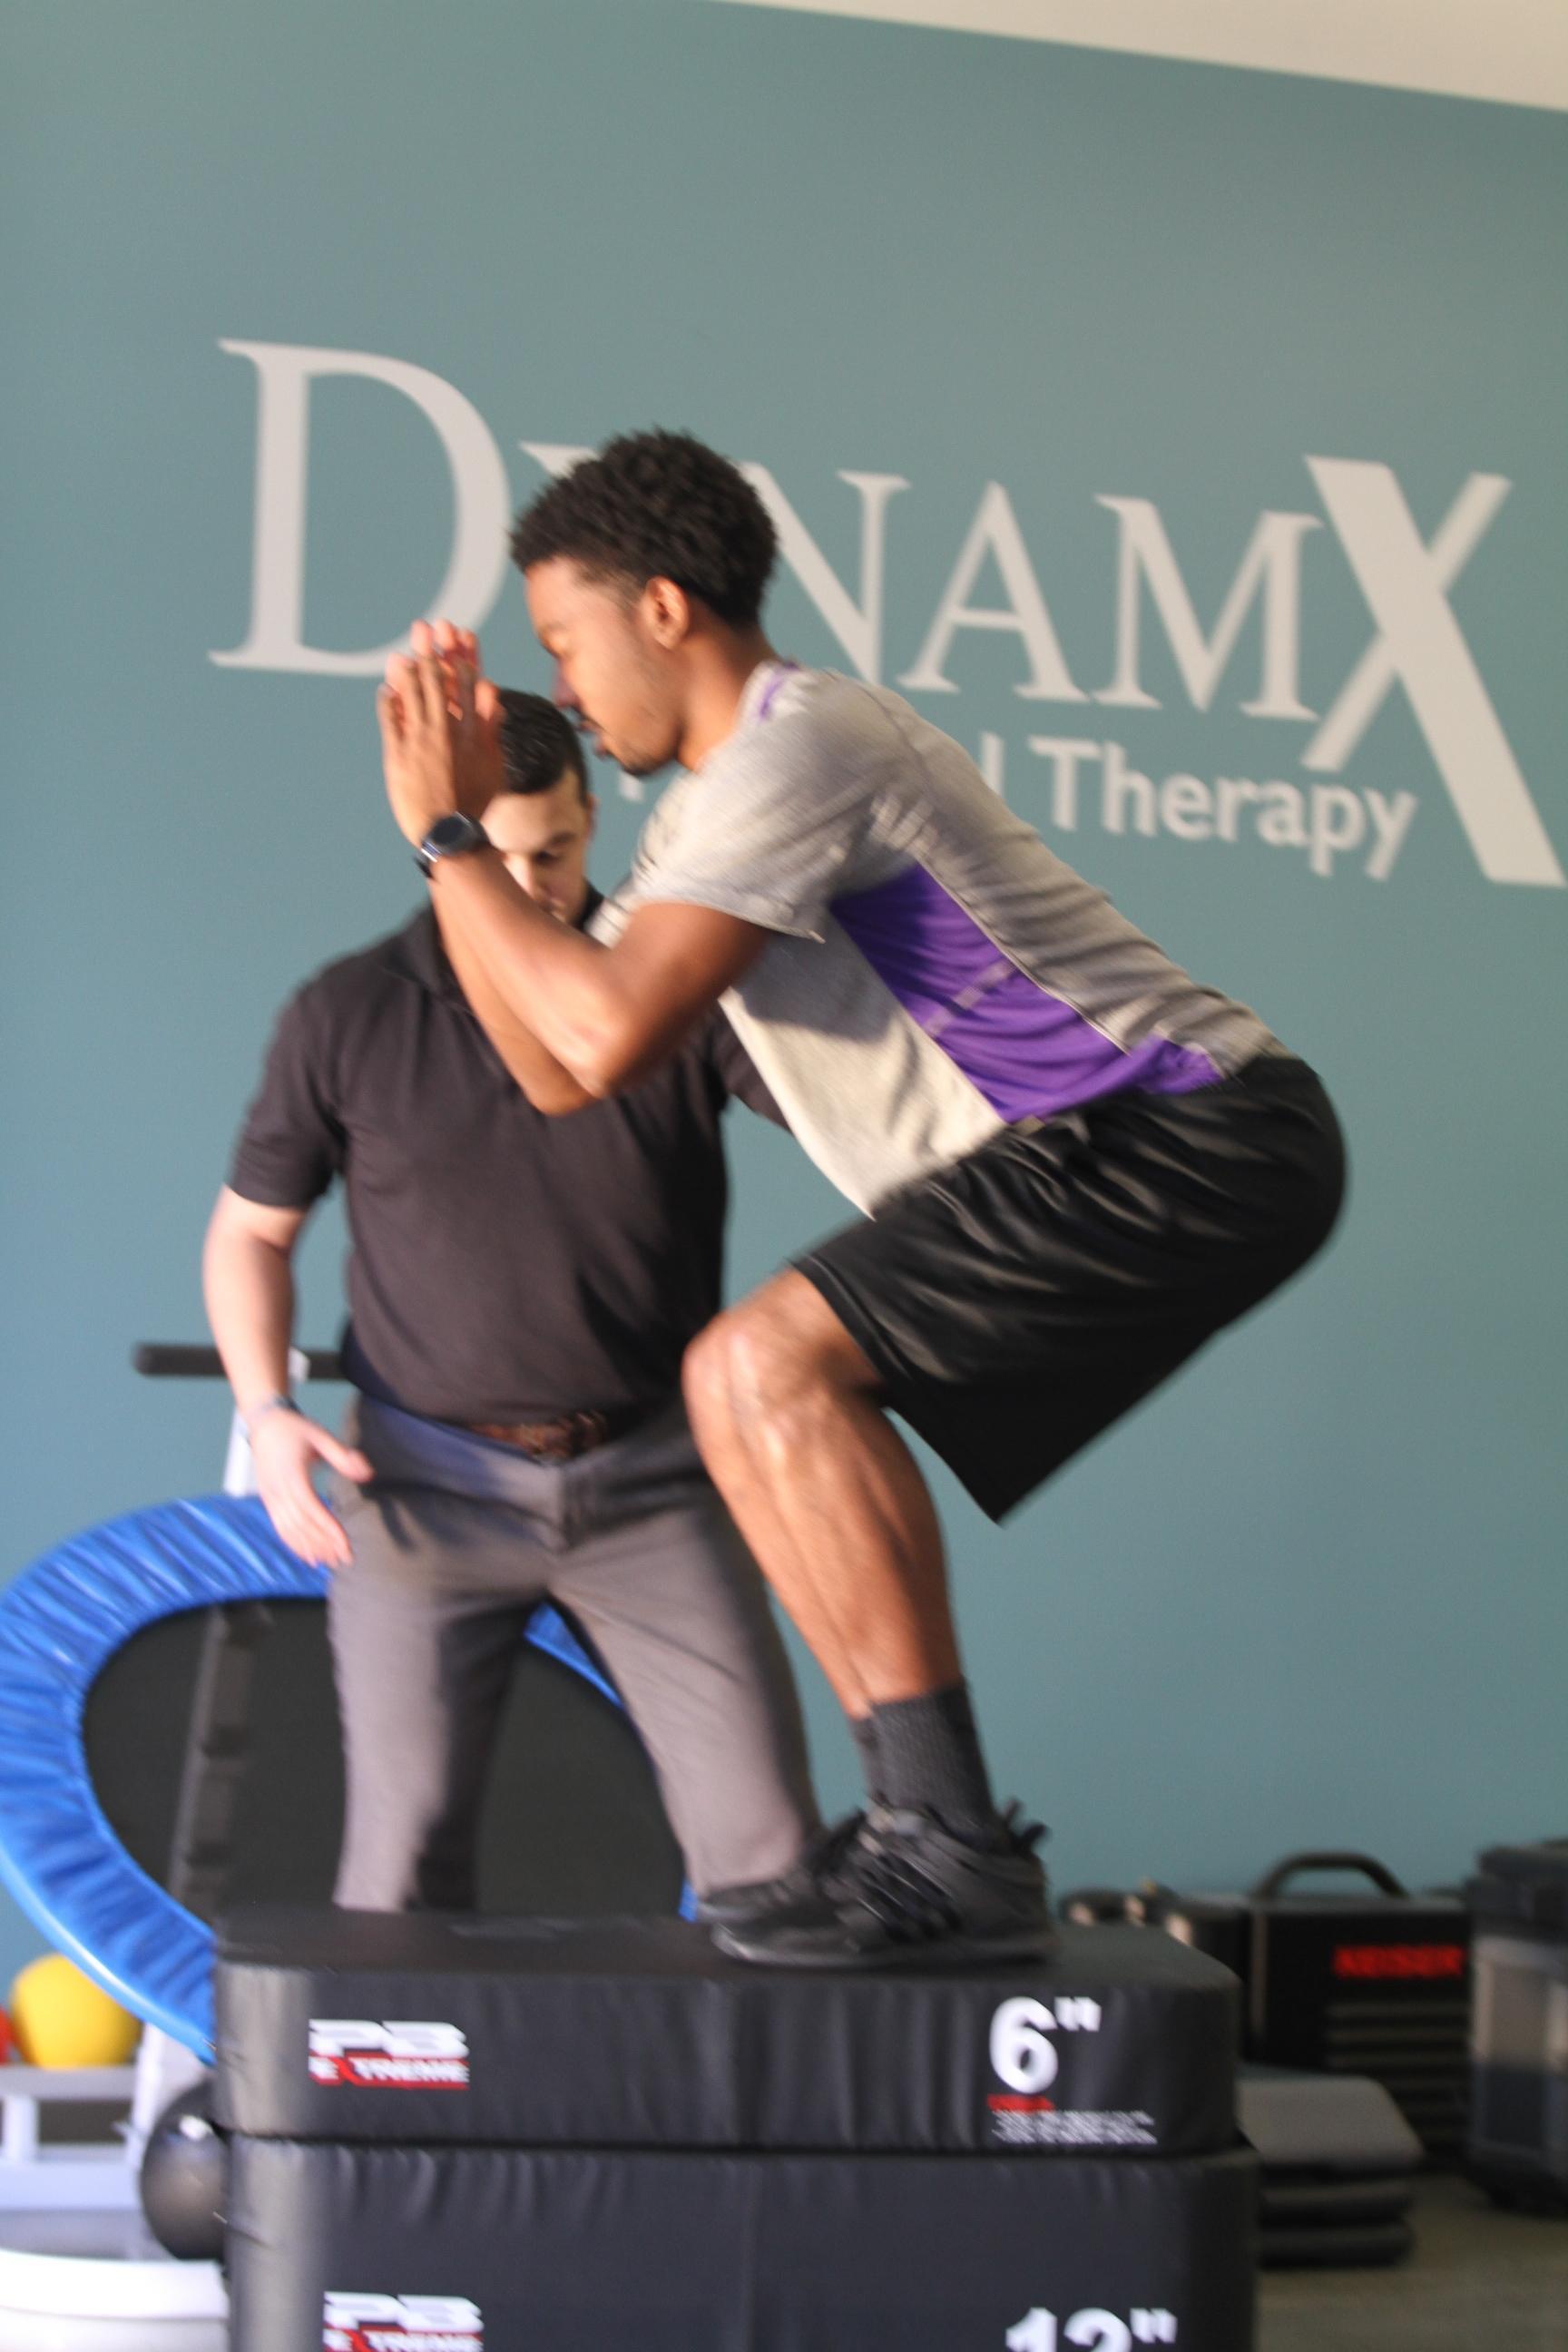 DynamX Physical Therapy Santa Monica image 12